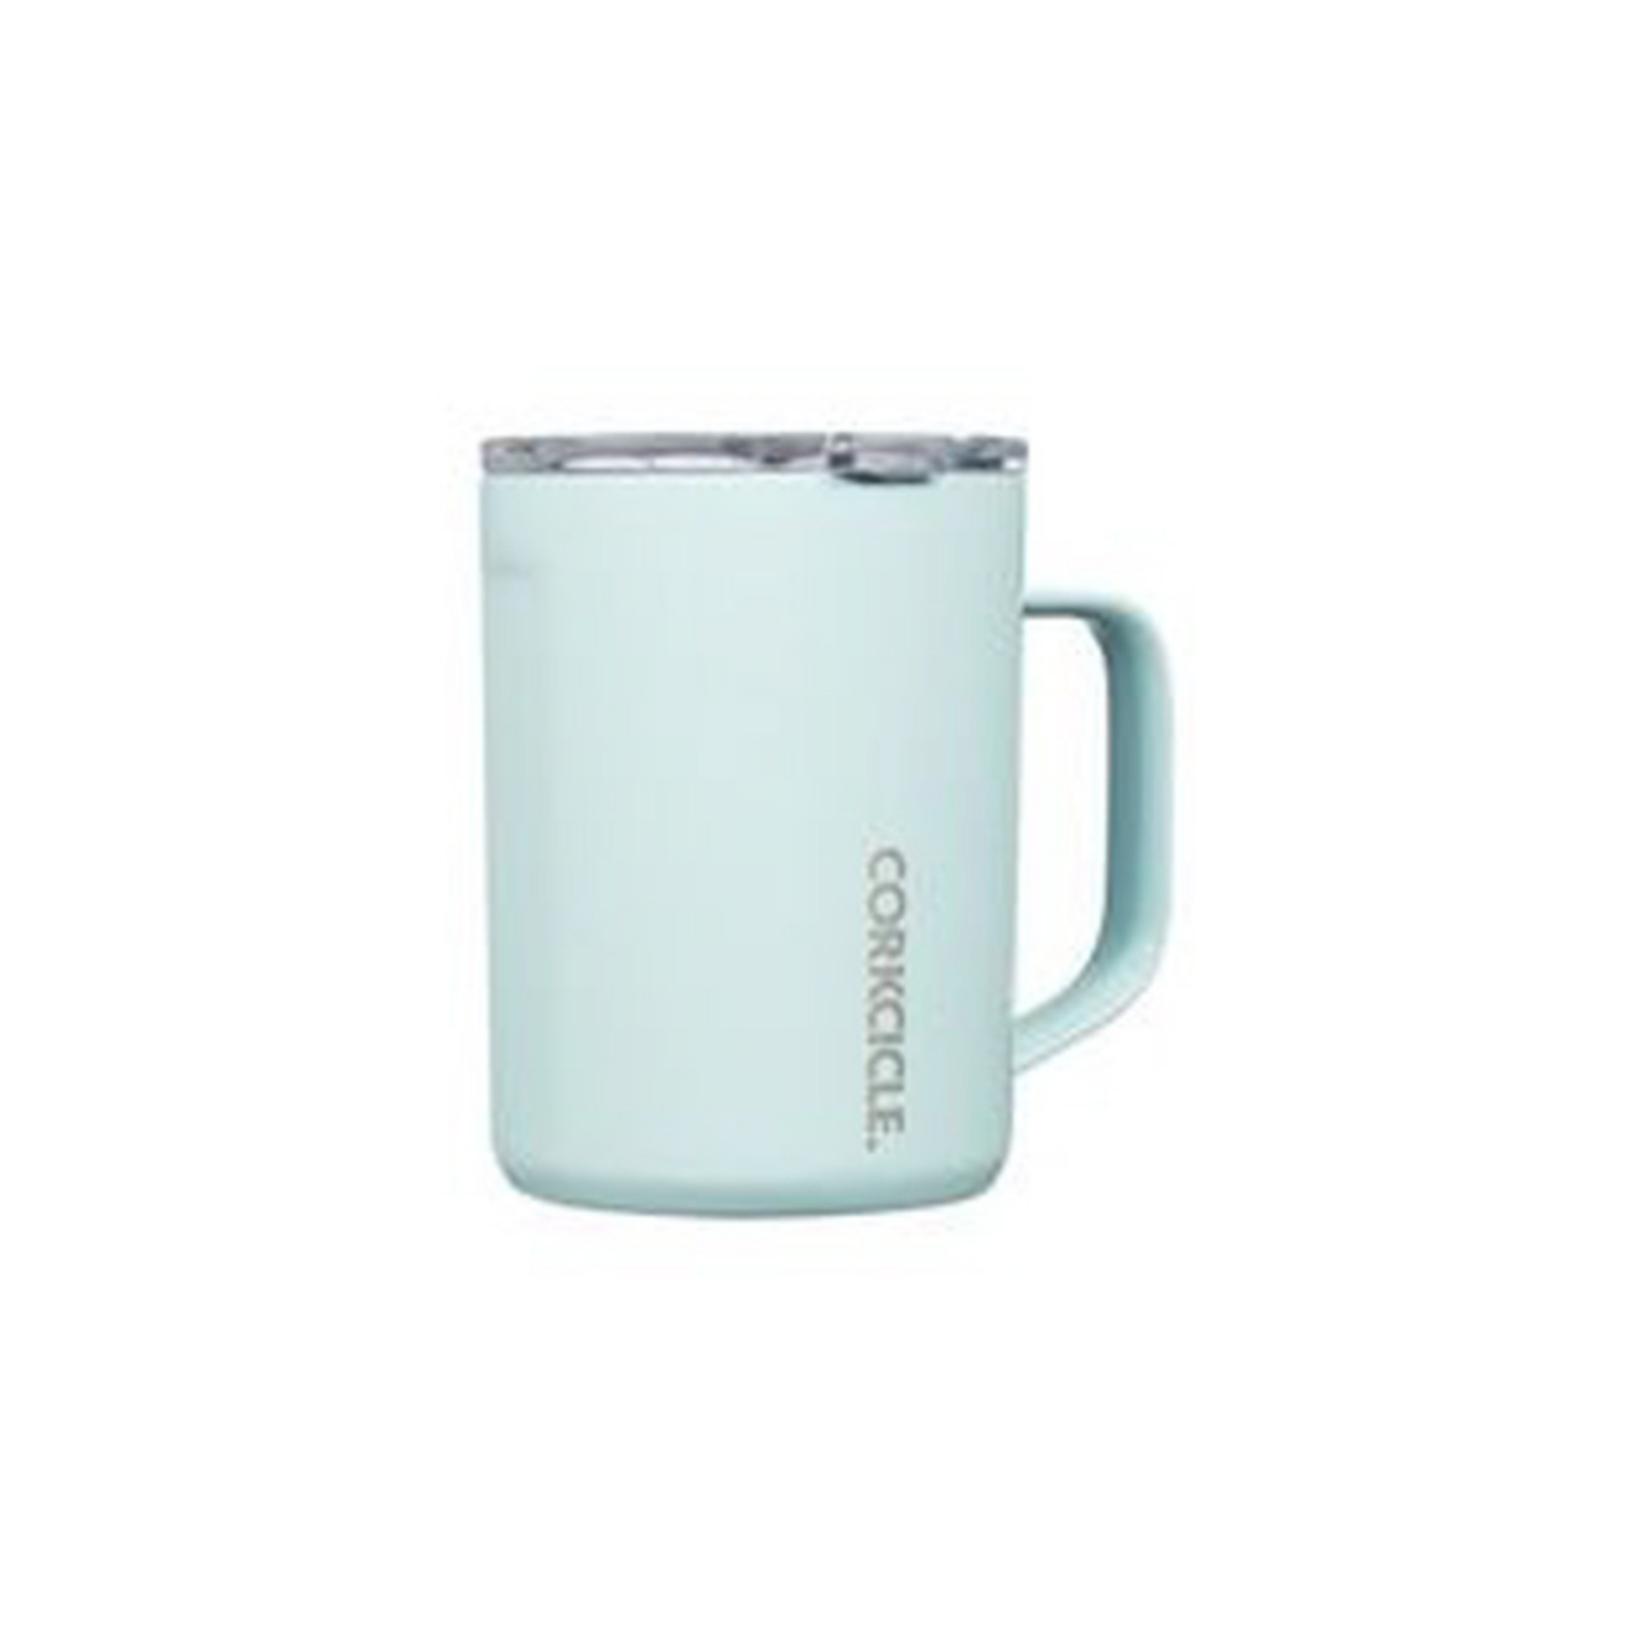 Corkcicle 16oz Mug Powder Blue